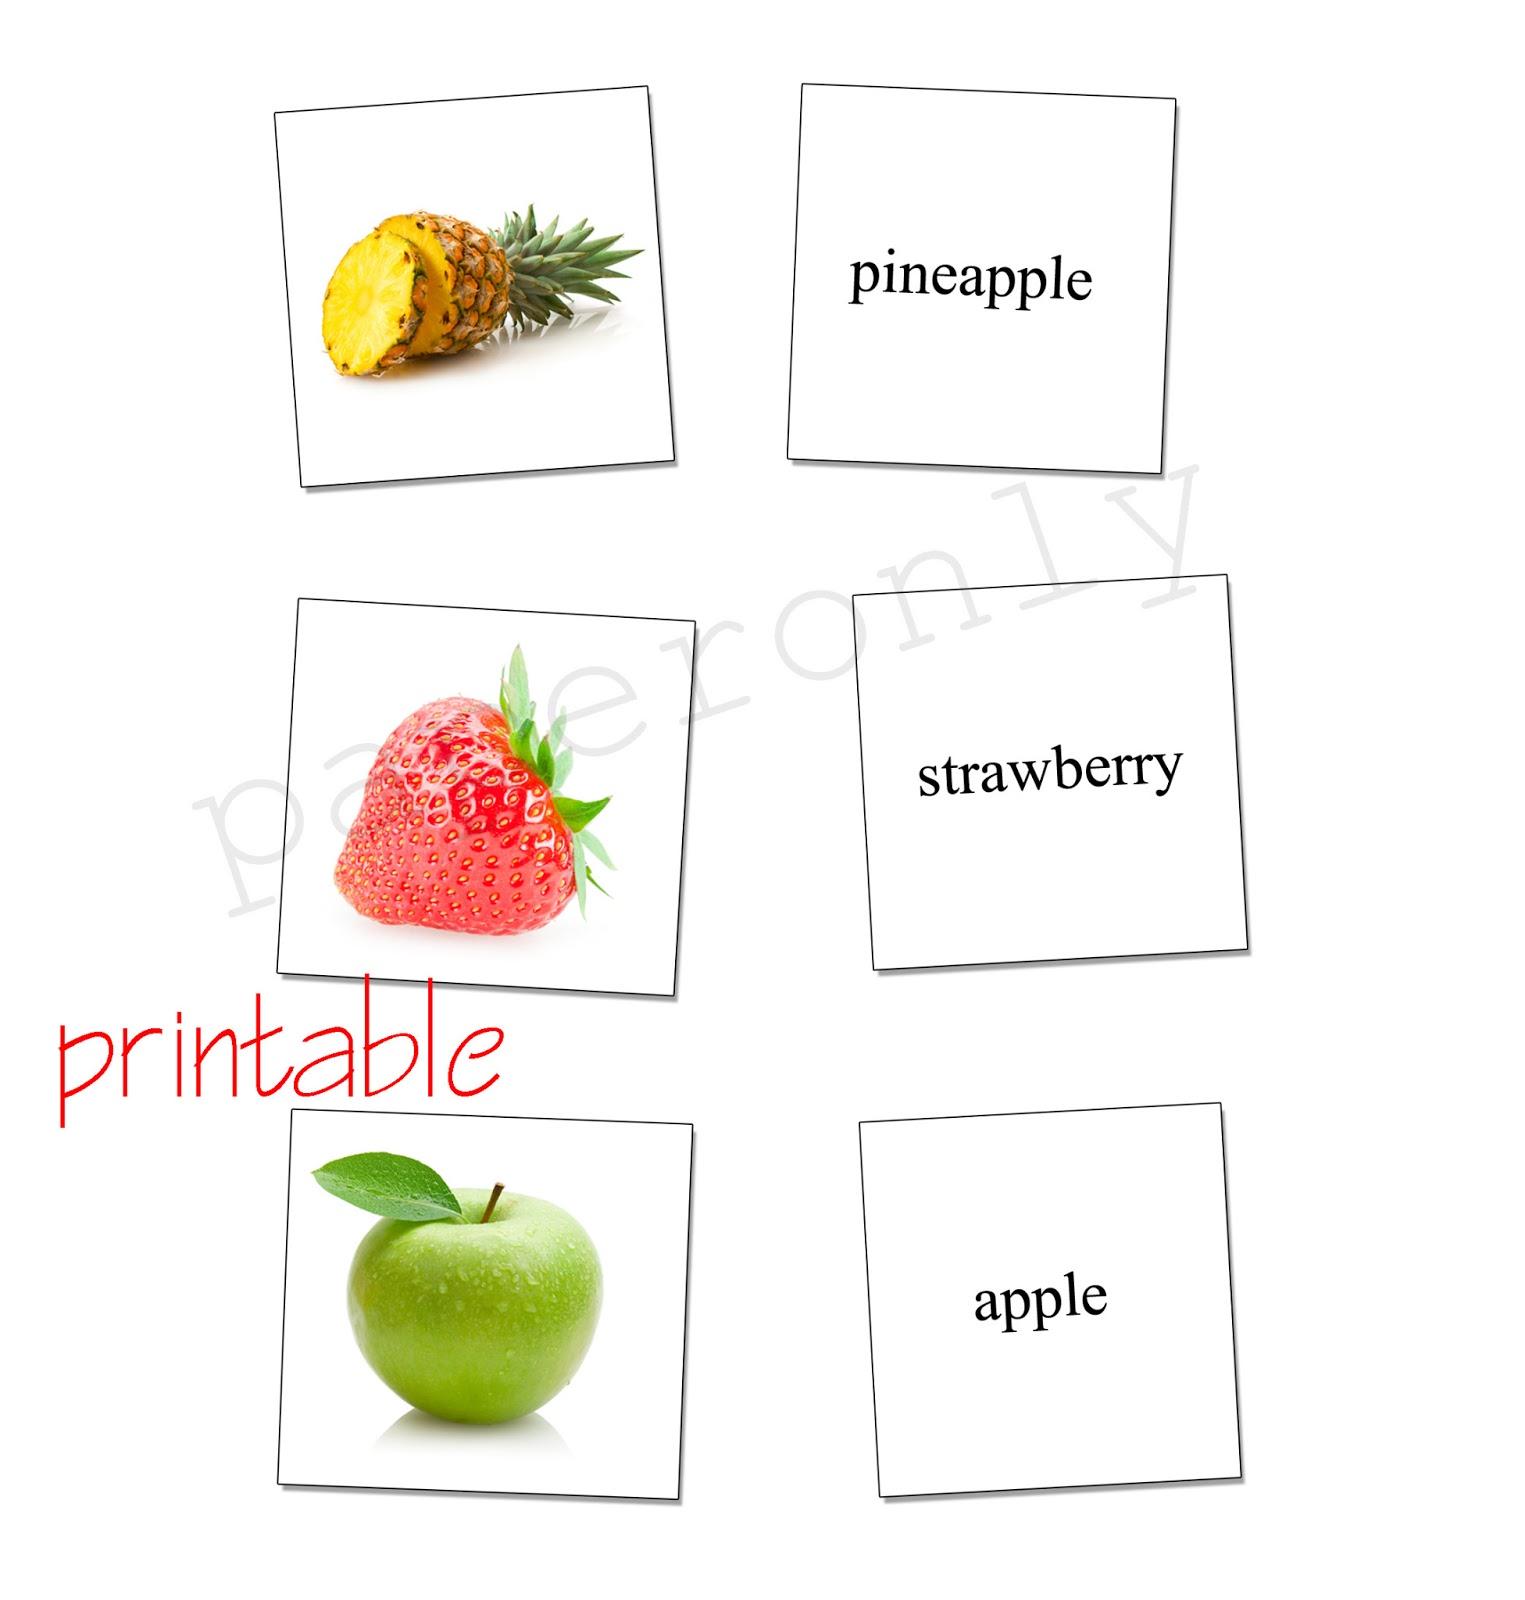 fruits name english to bengali pdf